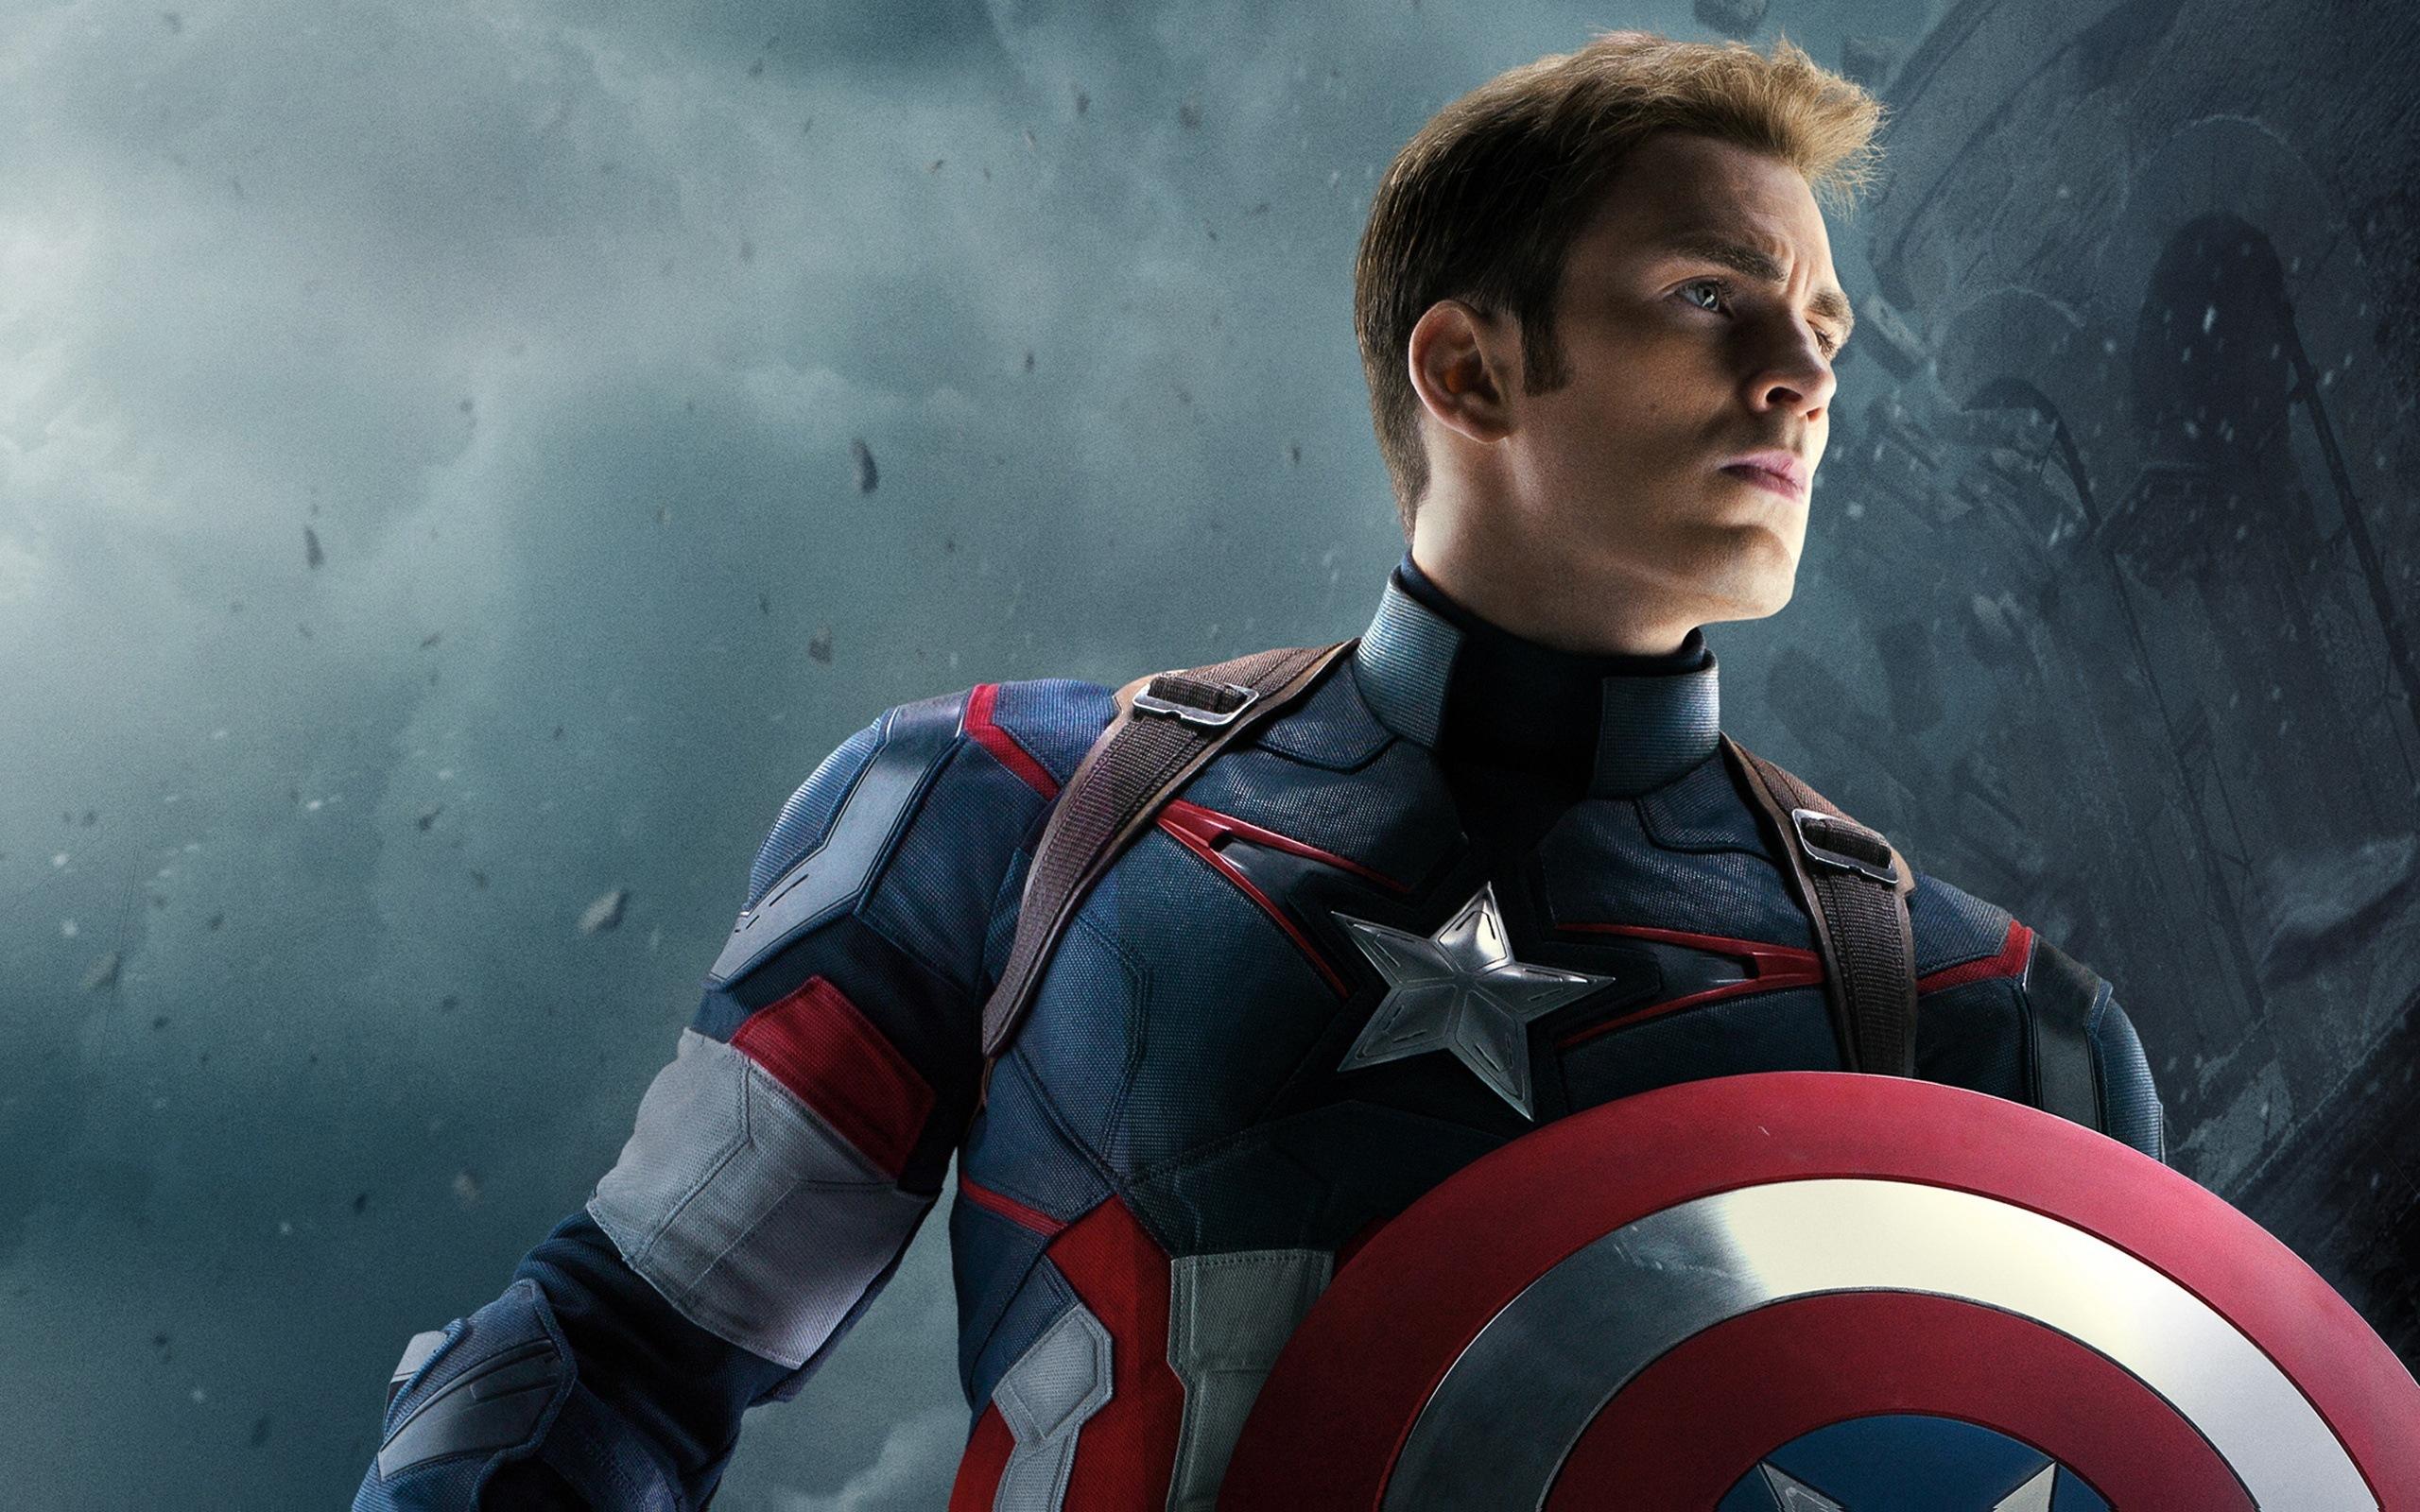 Chris Evans As Captain America Wallpaper Hd Ios Mode